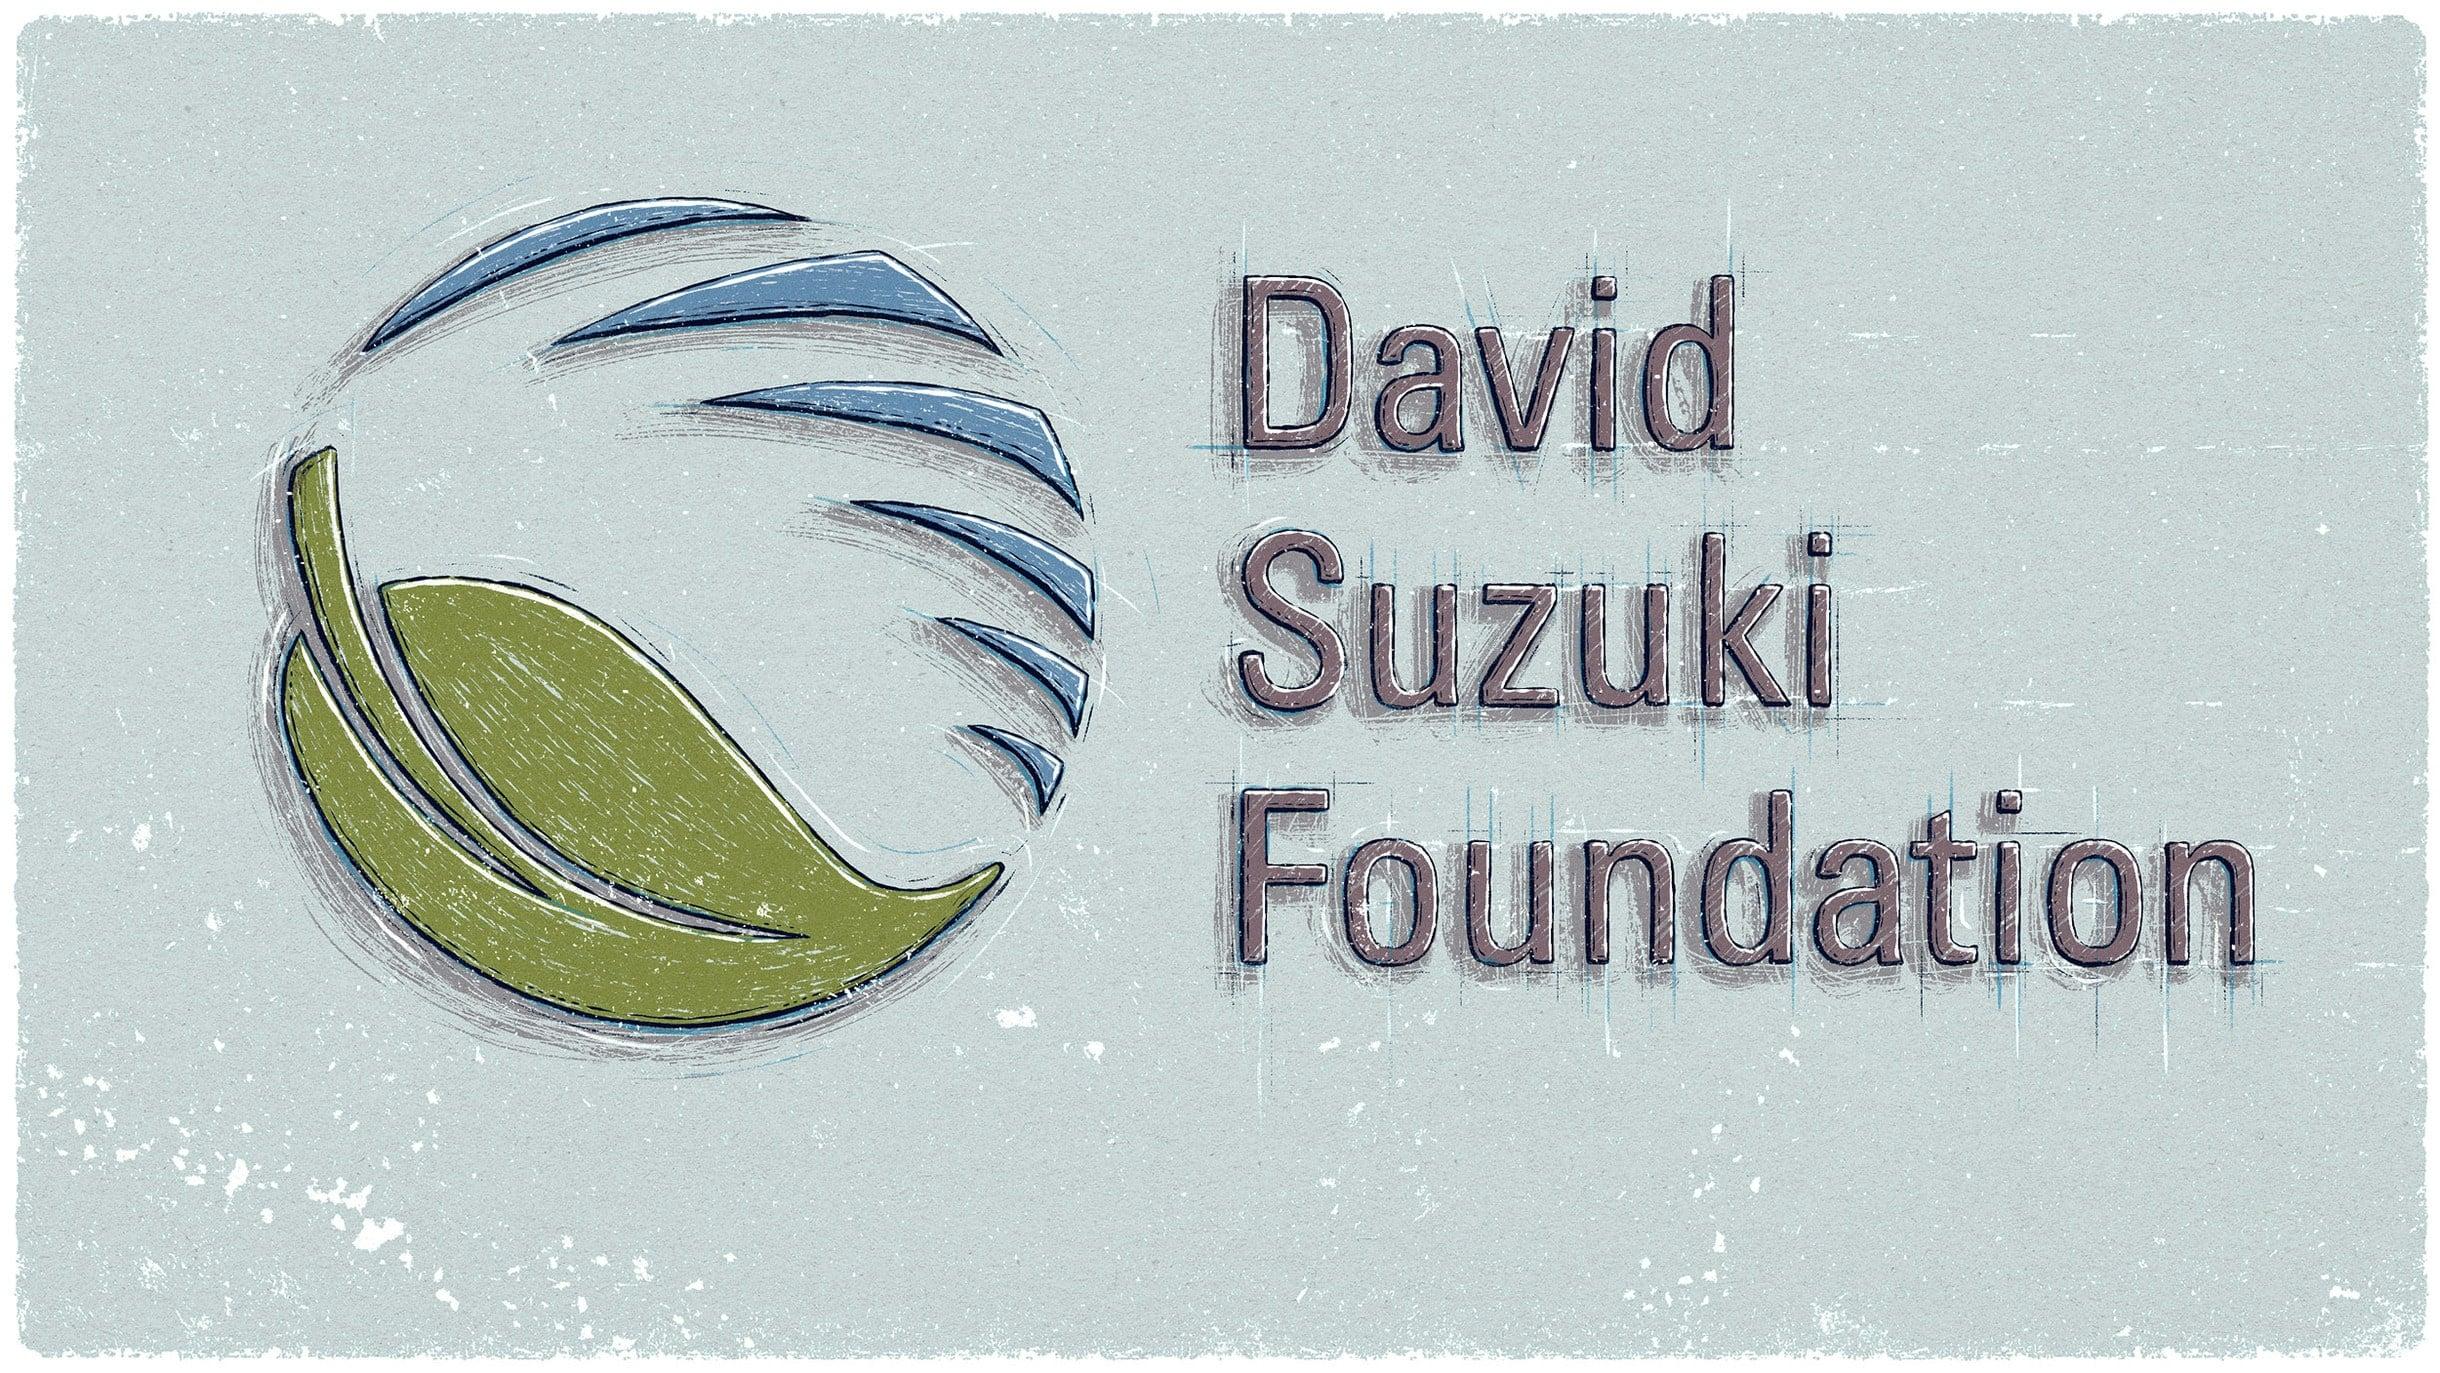 Why the David Suzuki Foundation Uses Rise HRIS